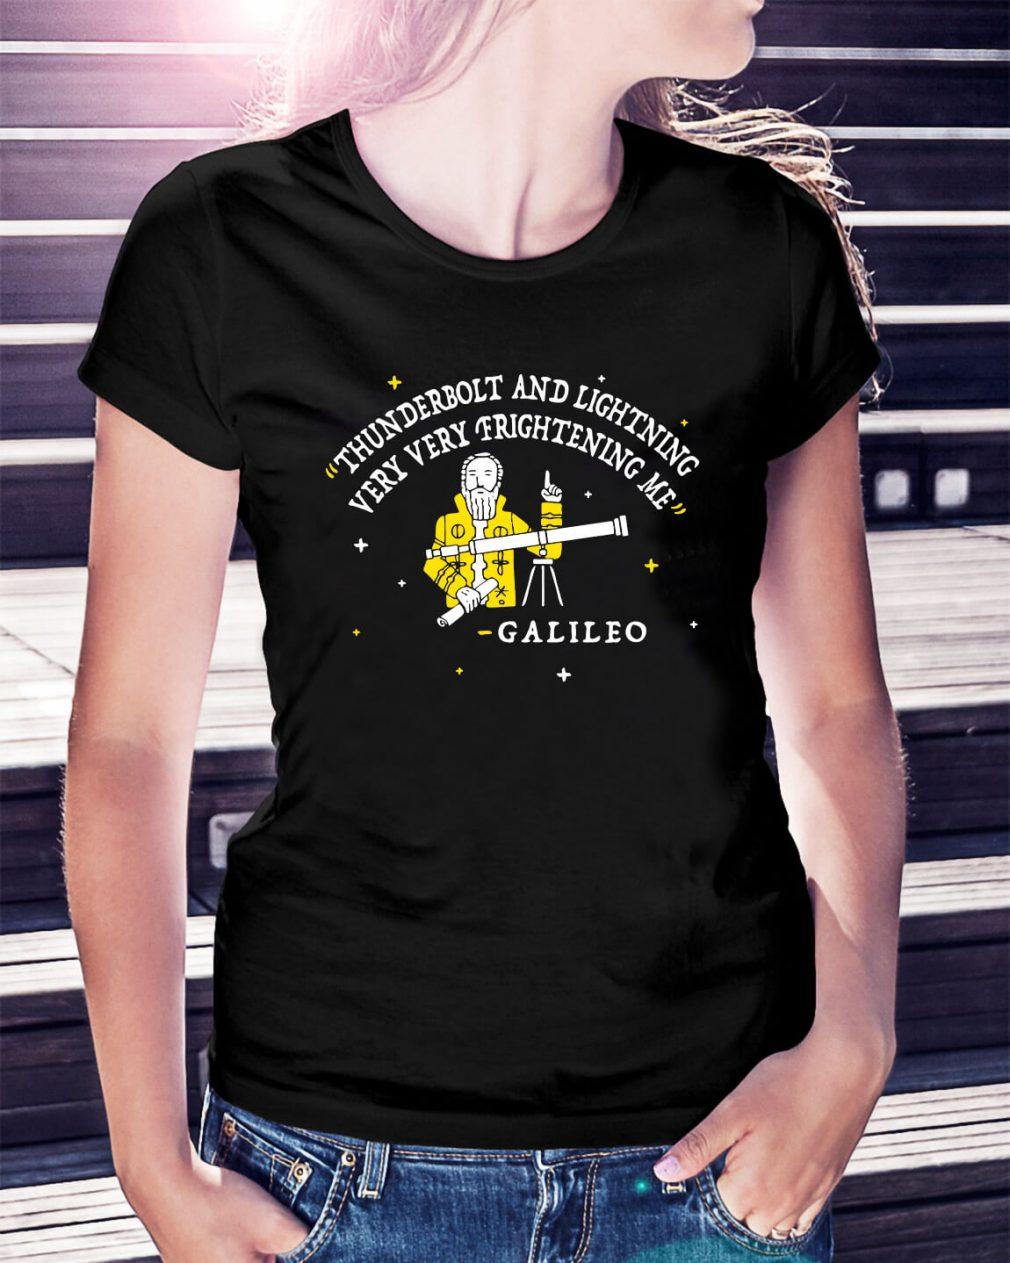 Thunderbolt and lightning very very frightening me Galileo Ladies Tee